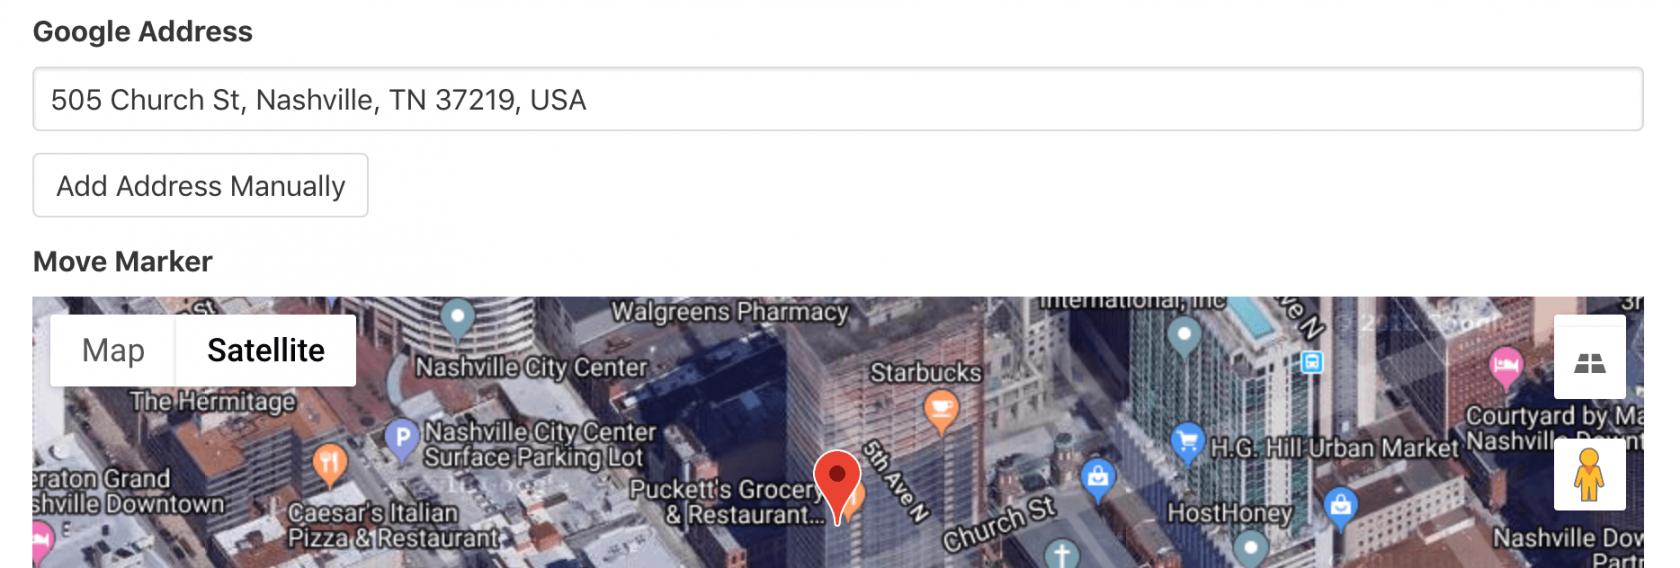 google-address.png